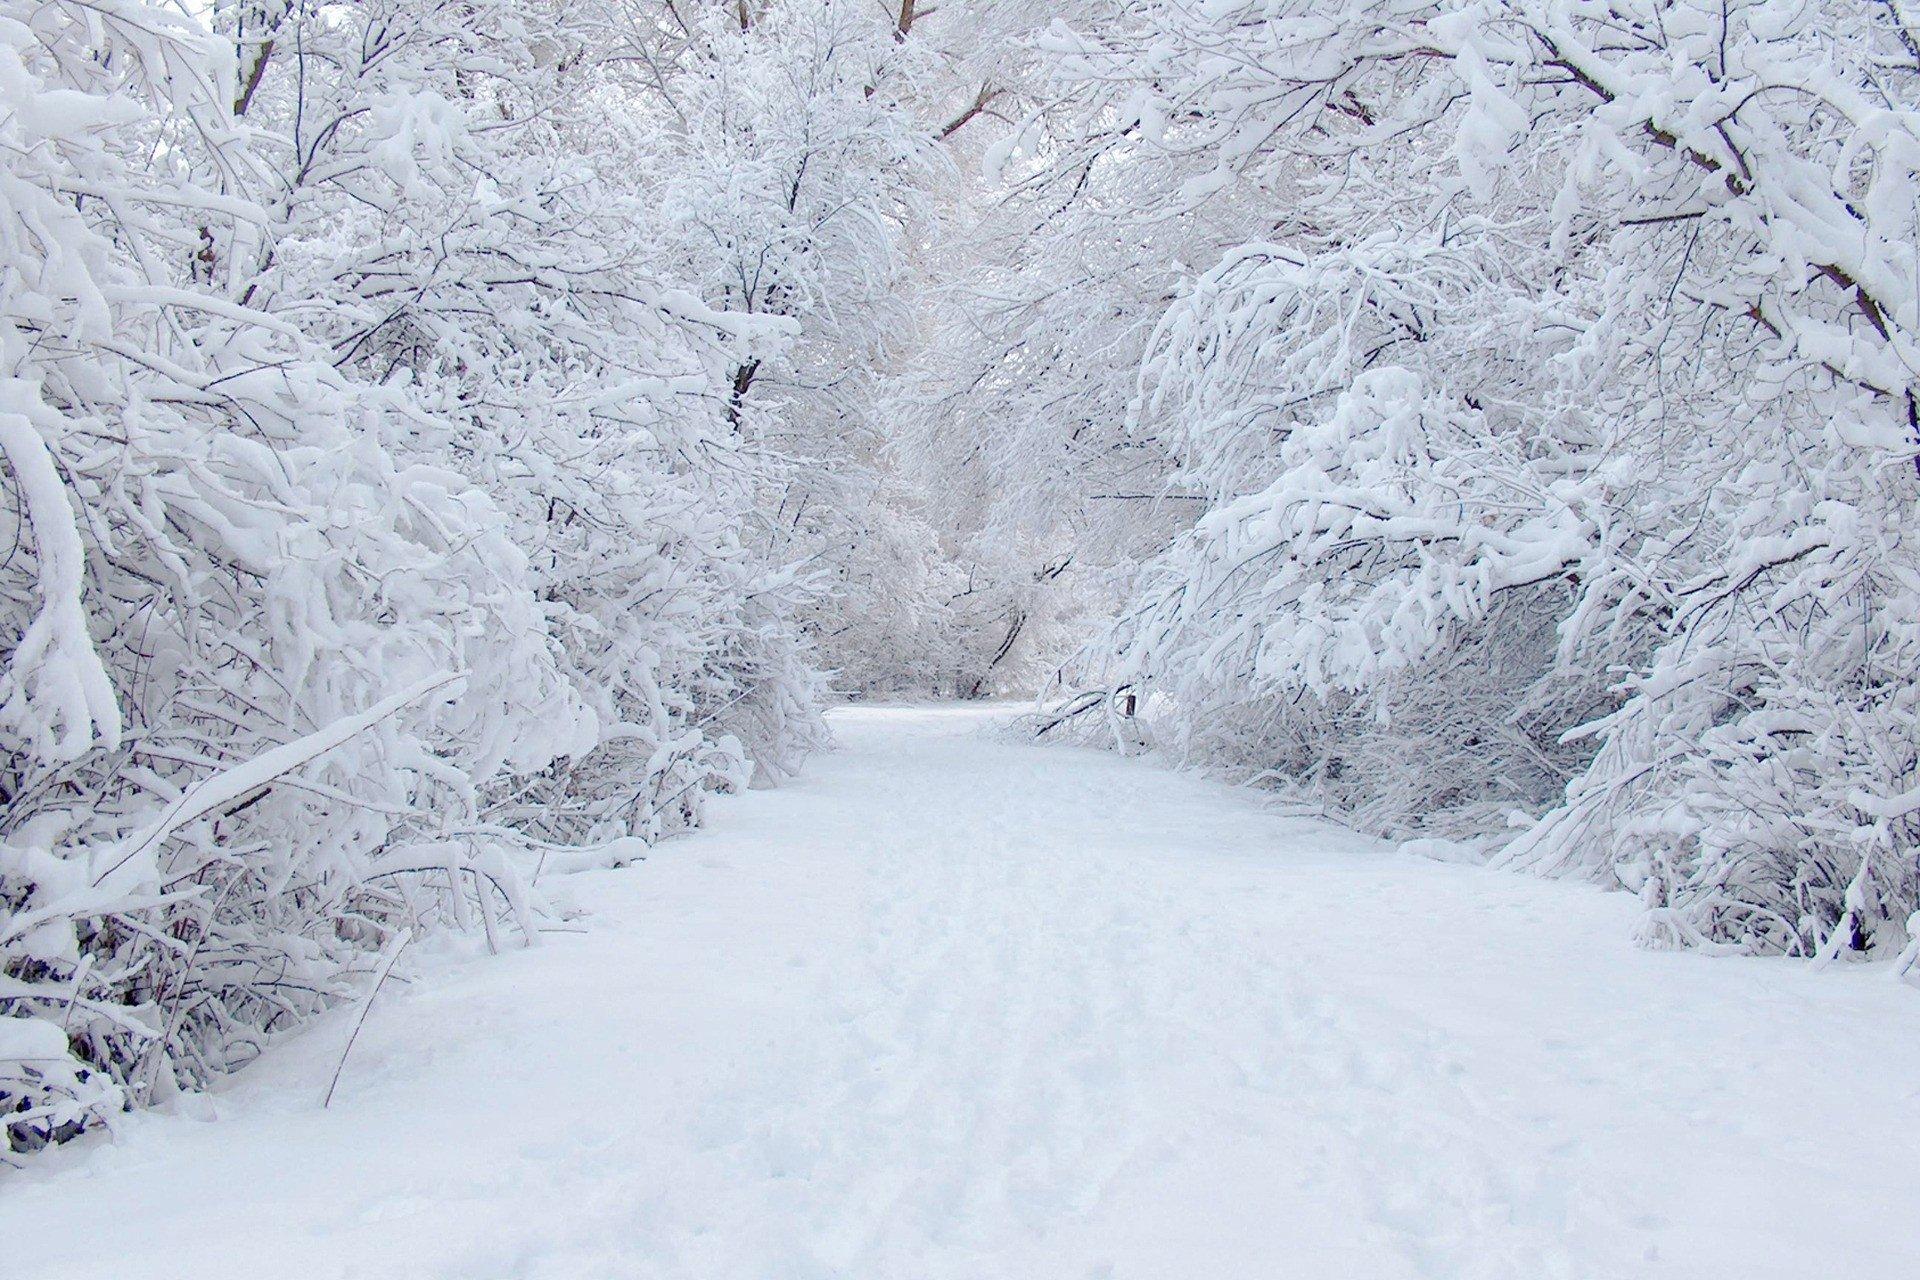 full snowfalling on road image